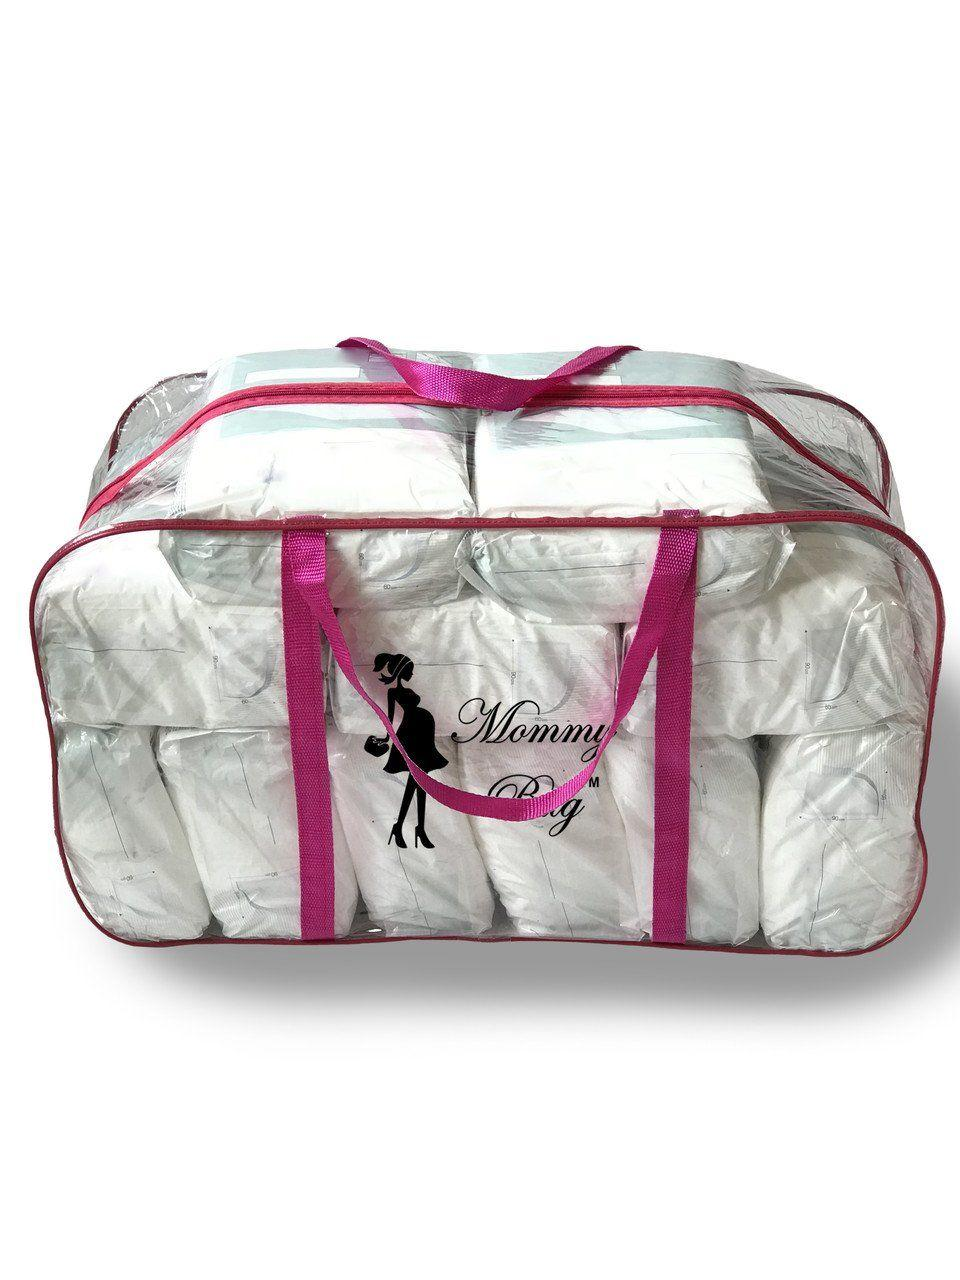 Сумка прозрачная в роддом Mommy Bag, размер - XL, цвет - Розовый